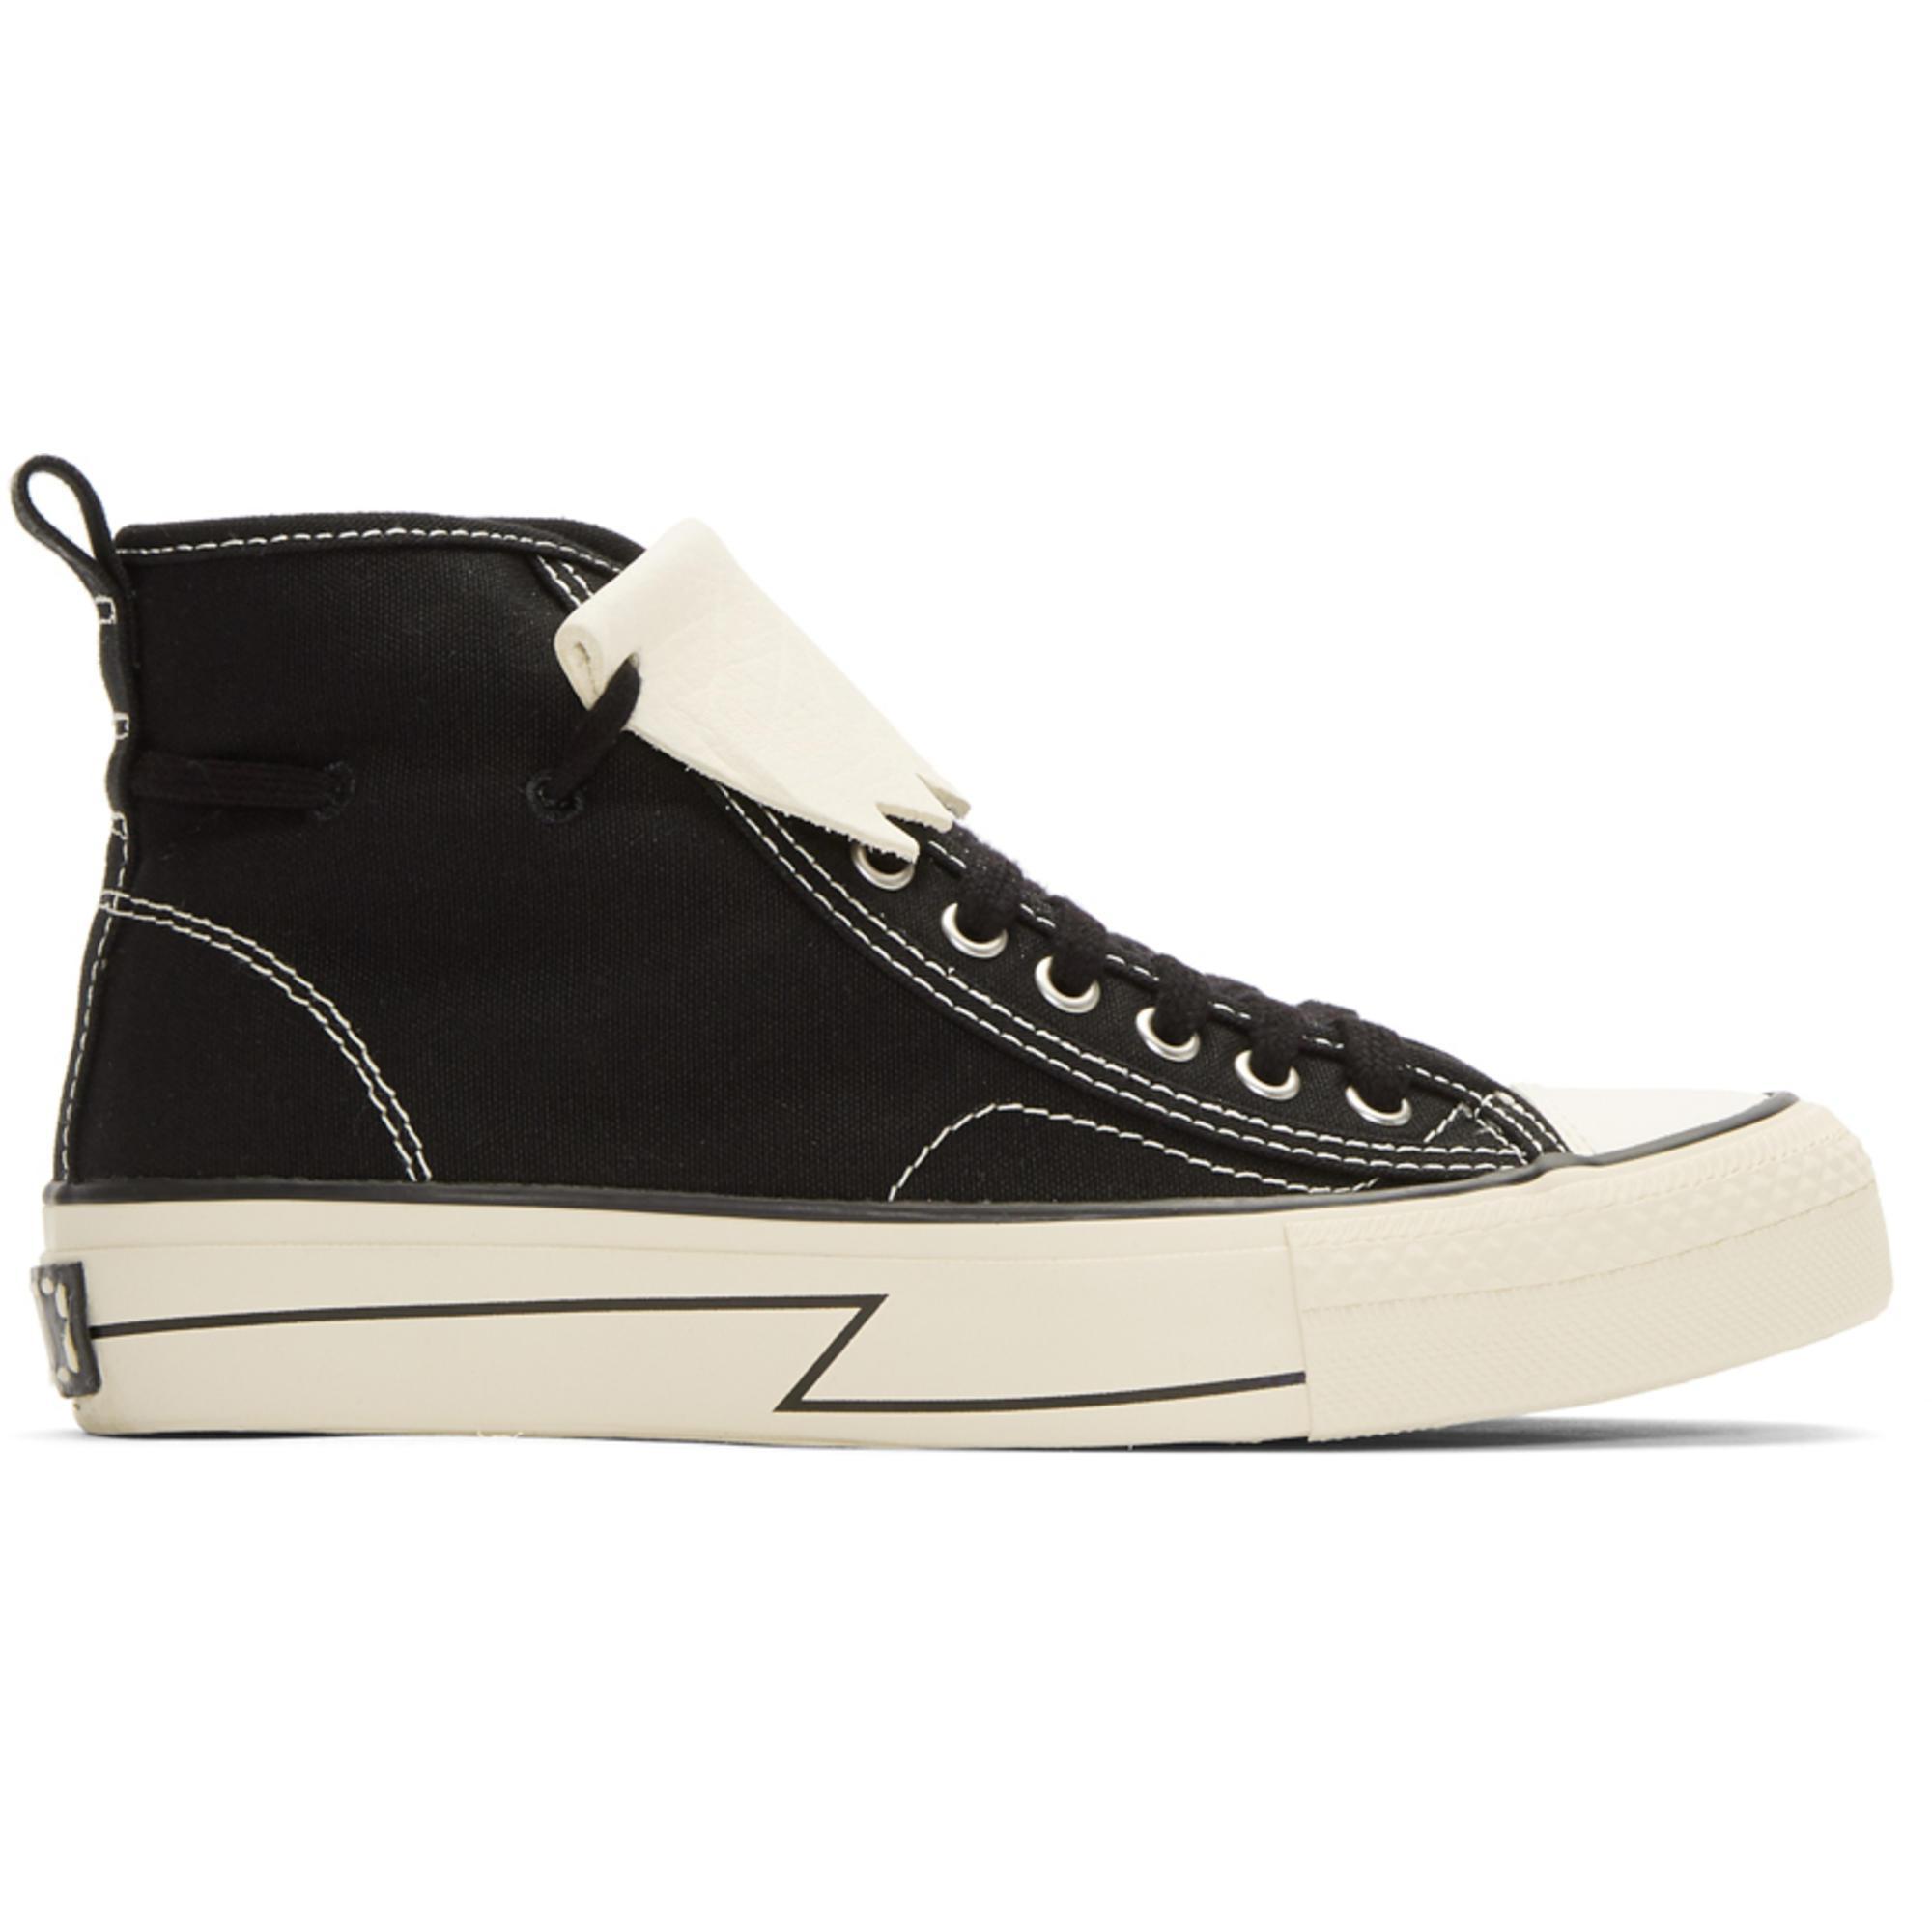 Joshua Sanders Black Skagway Kiltie High-Top Sneakers 7t3nsjs7